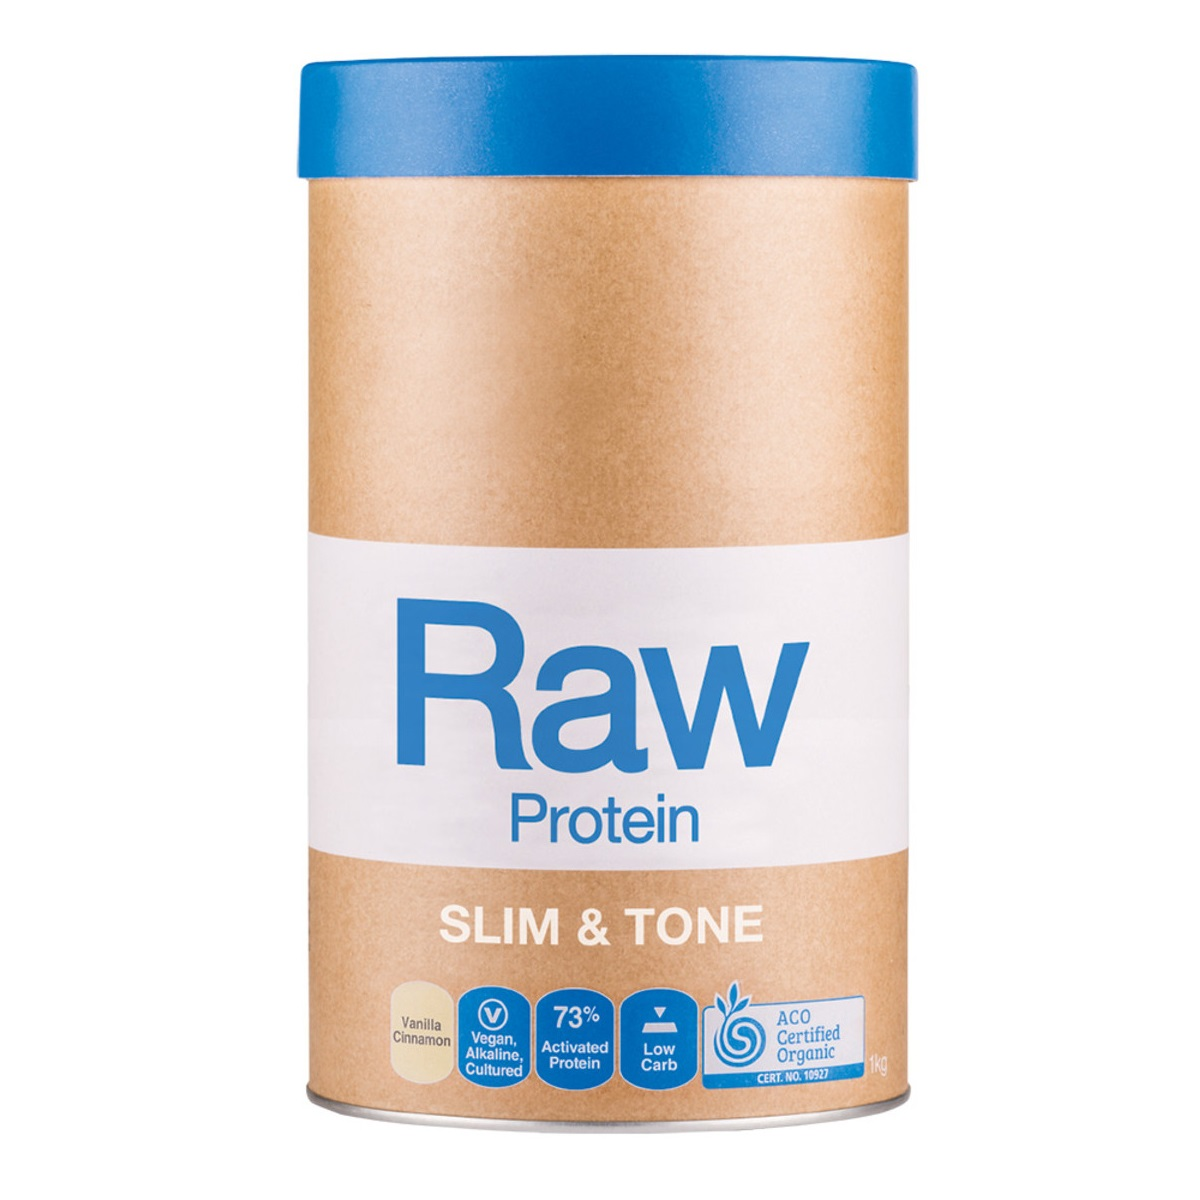 Amazonia Raw Slim & Tone Protein - Vanilla & Cinnamon